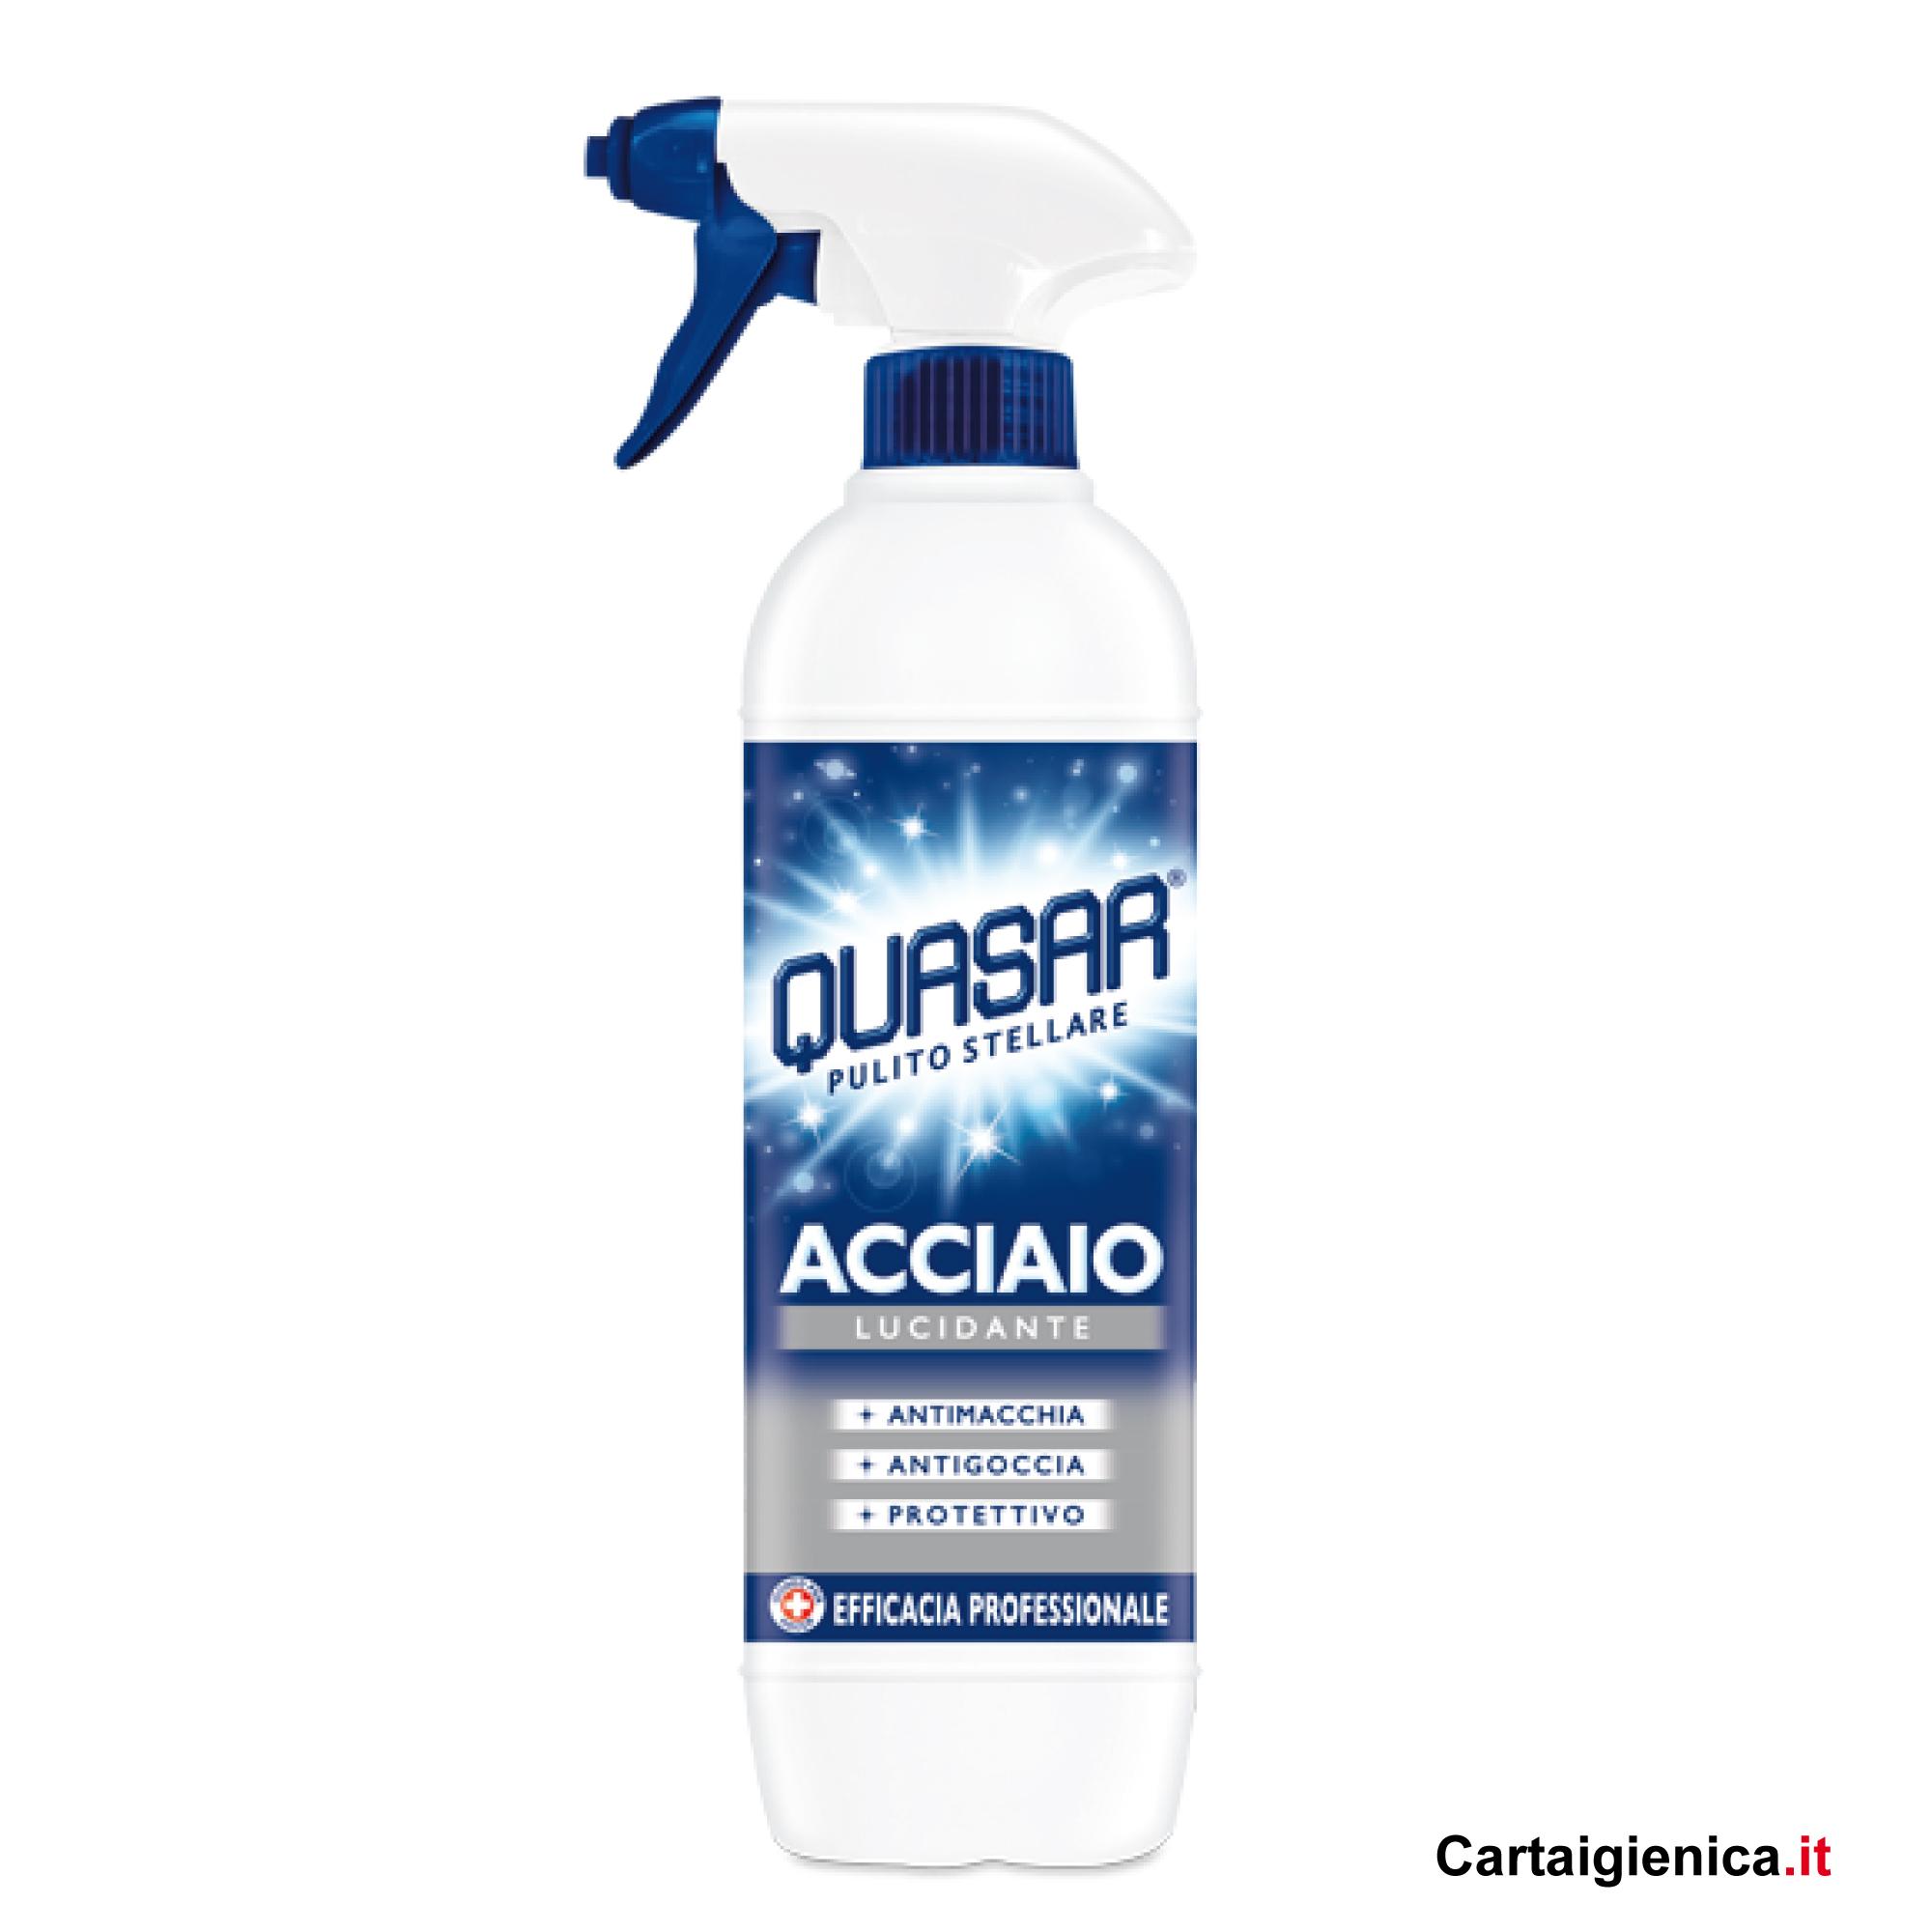 quasar acciaio spray 650 ml pulizia